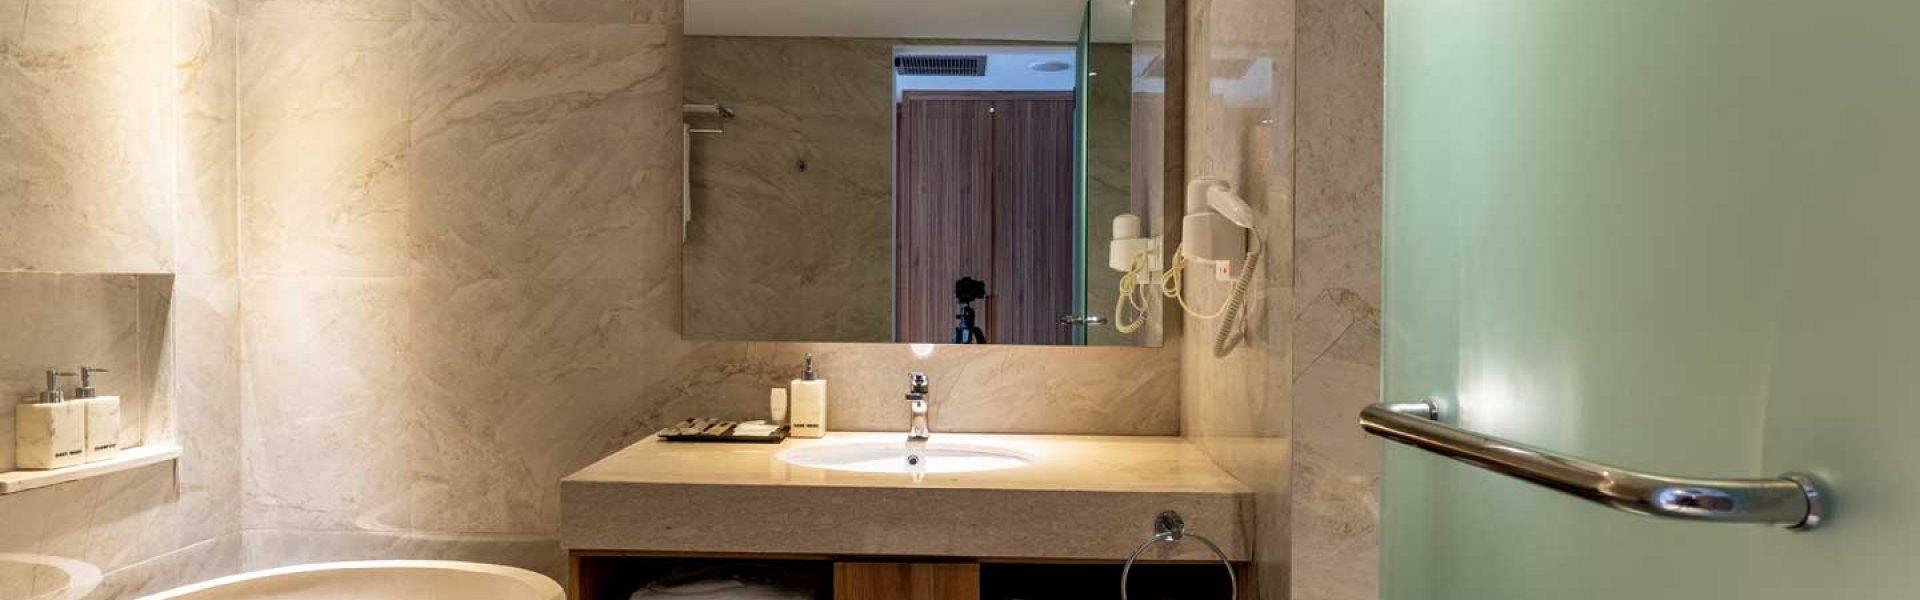 Capital Hotel Grand Deluxe Bath Room